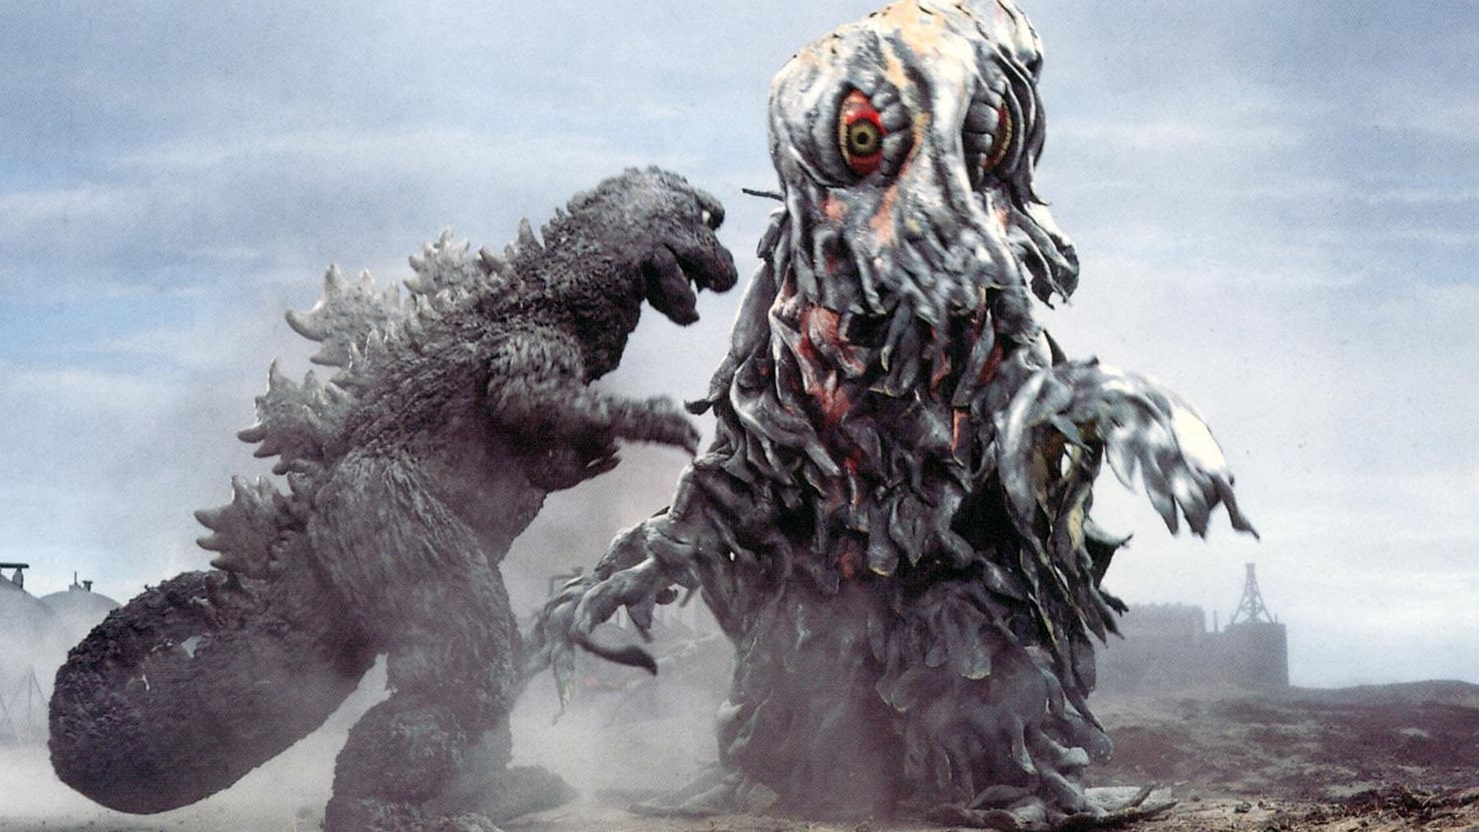 Godzilla vs. the Smog Monster Hedorah